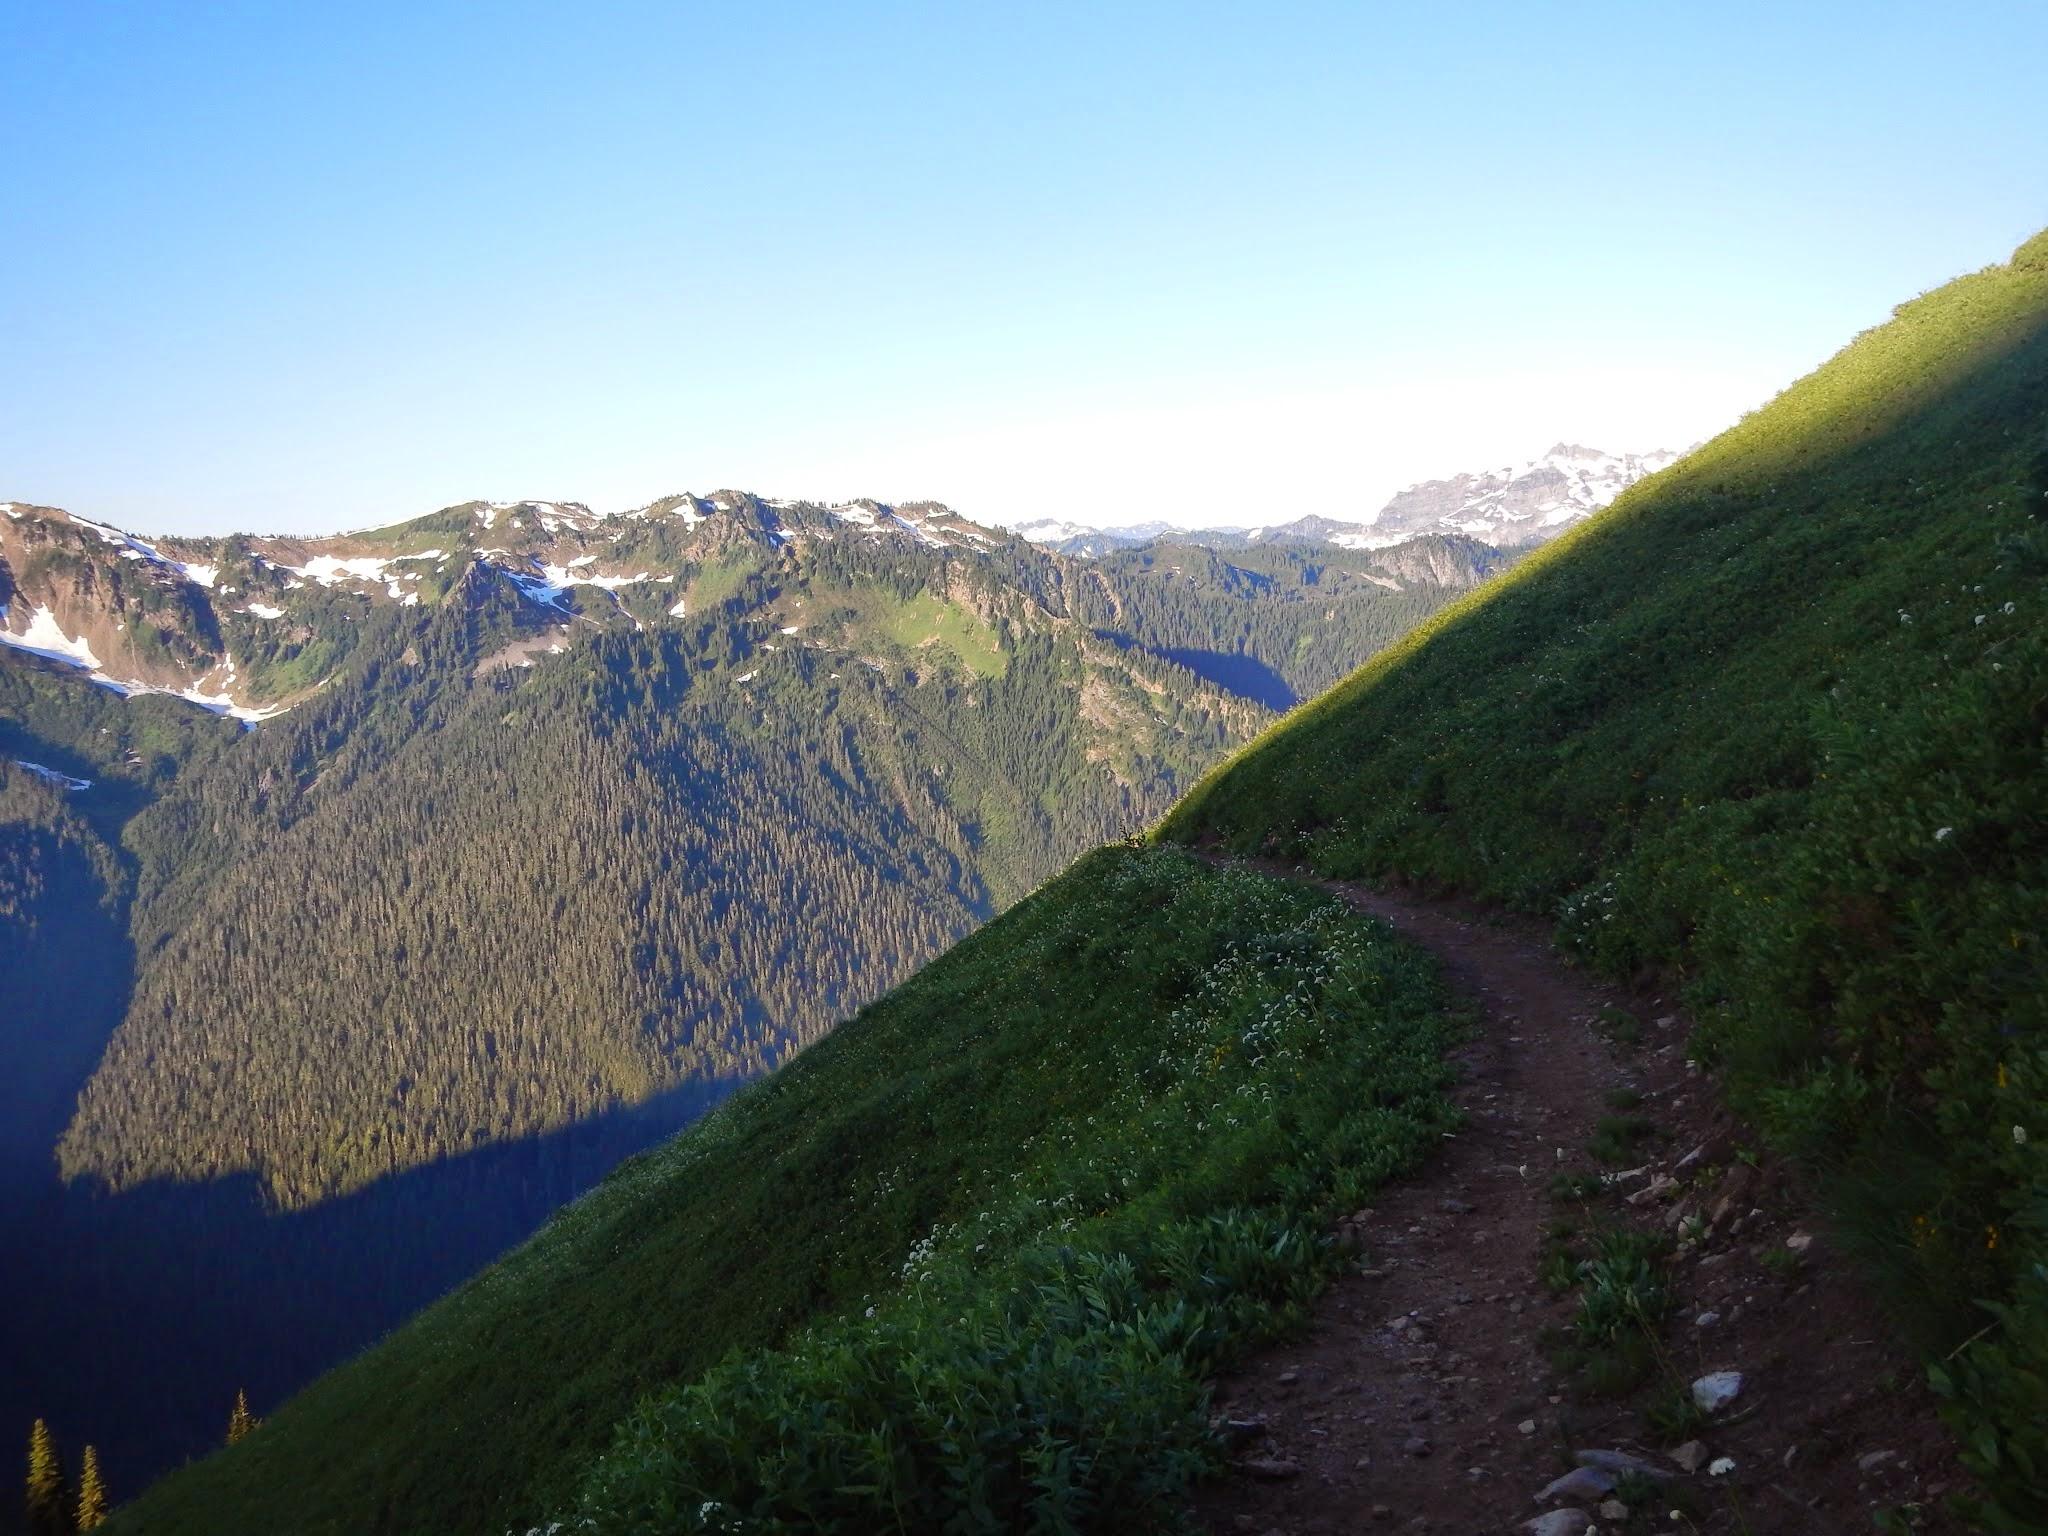 Photo: Hiking through the meadows